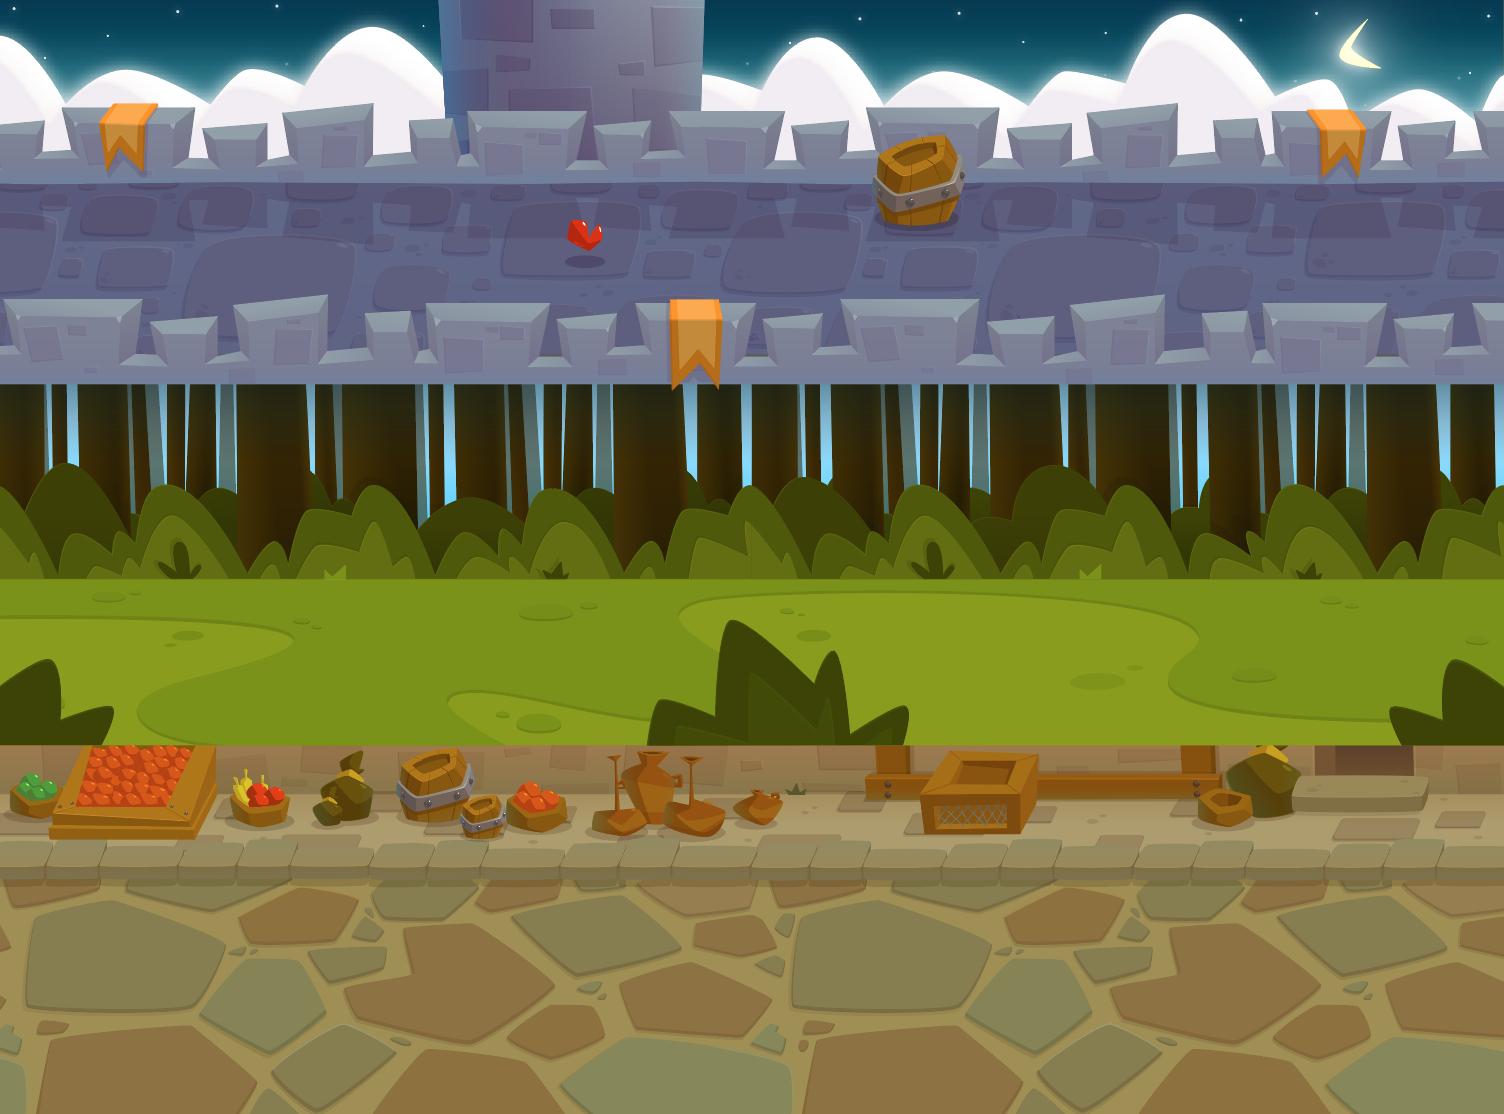 3 Side Scrolling RPG Backgrounds